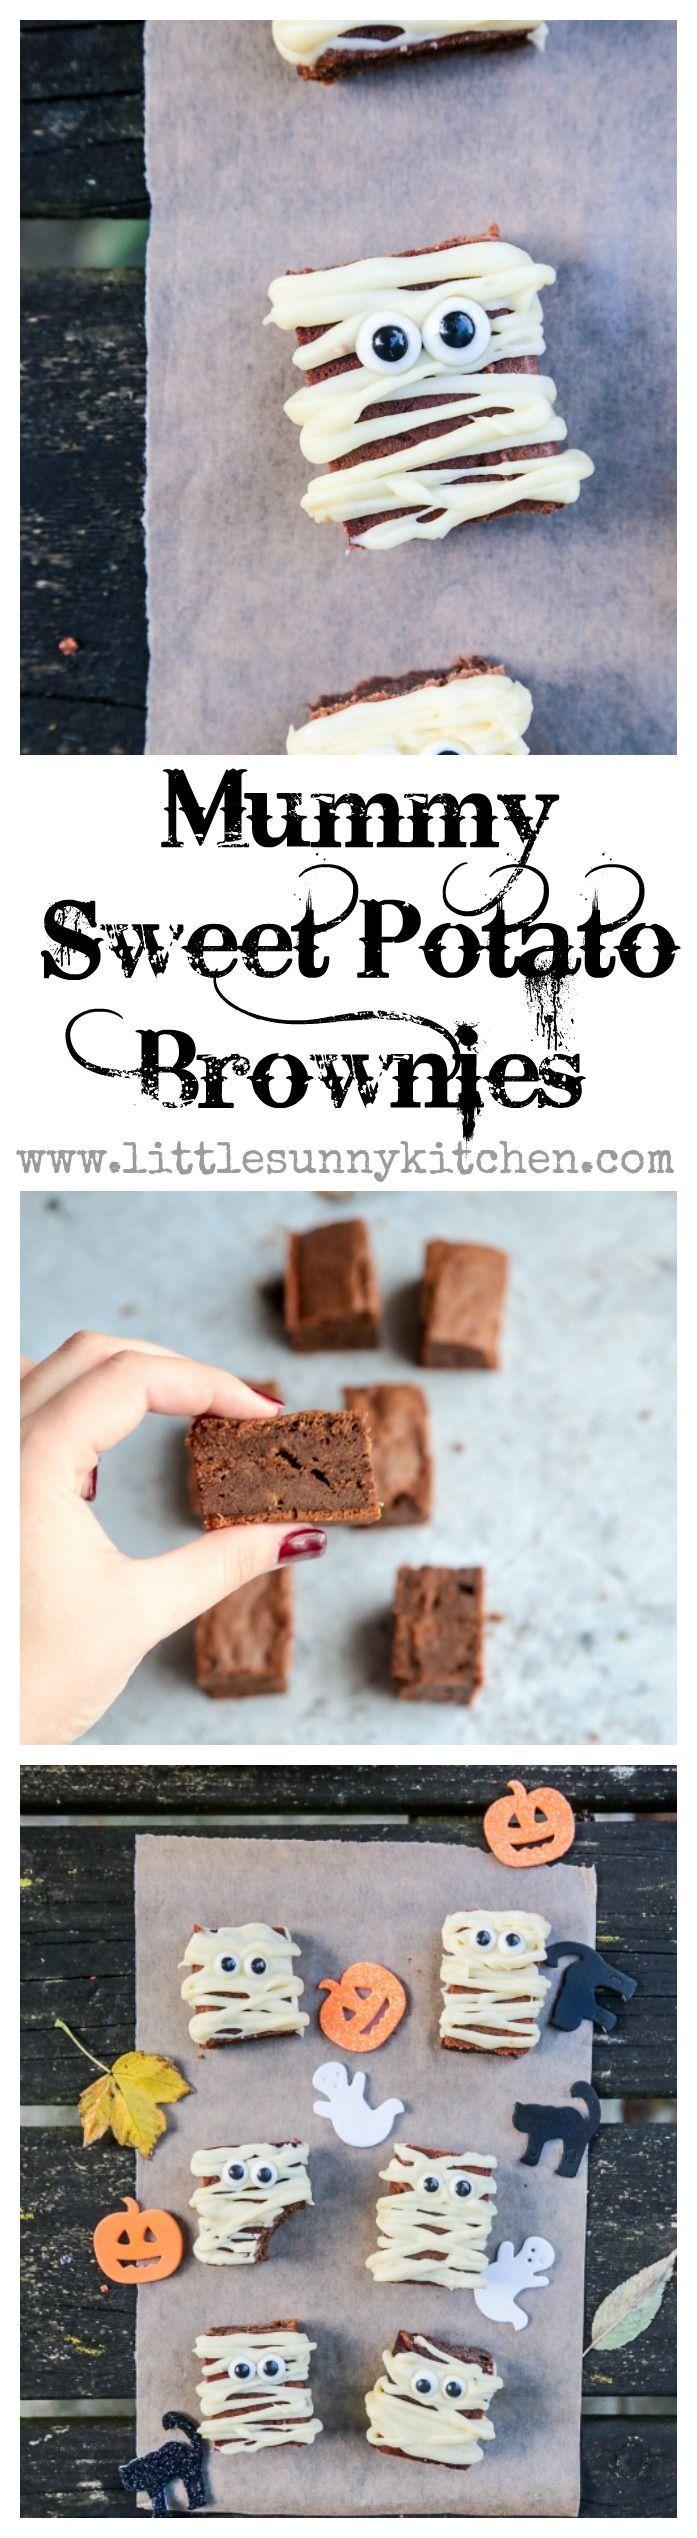 Easy and fun Mummy sweet potato brownies for Halloween!